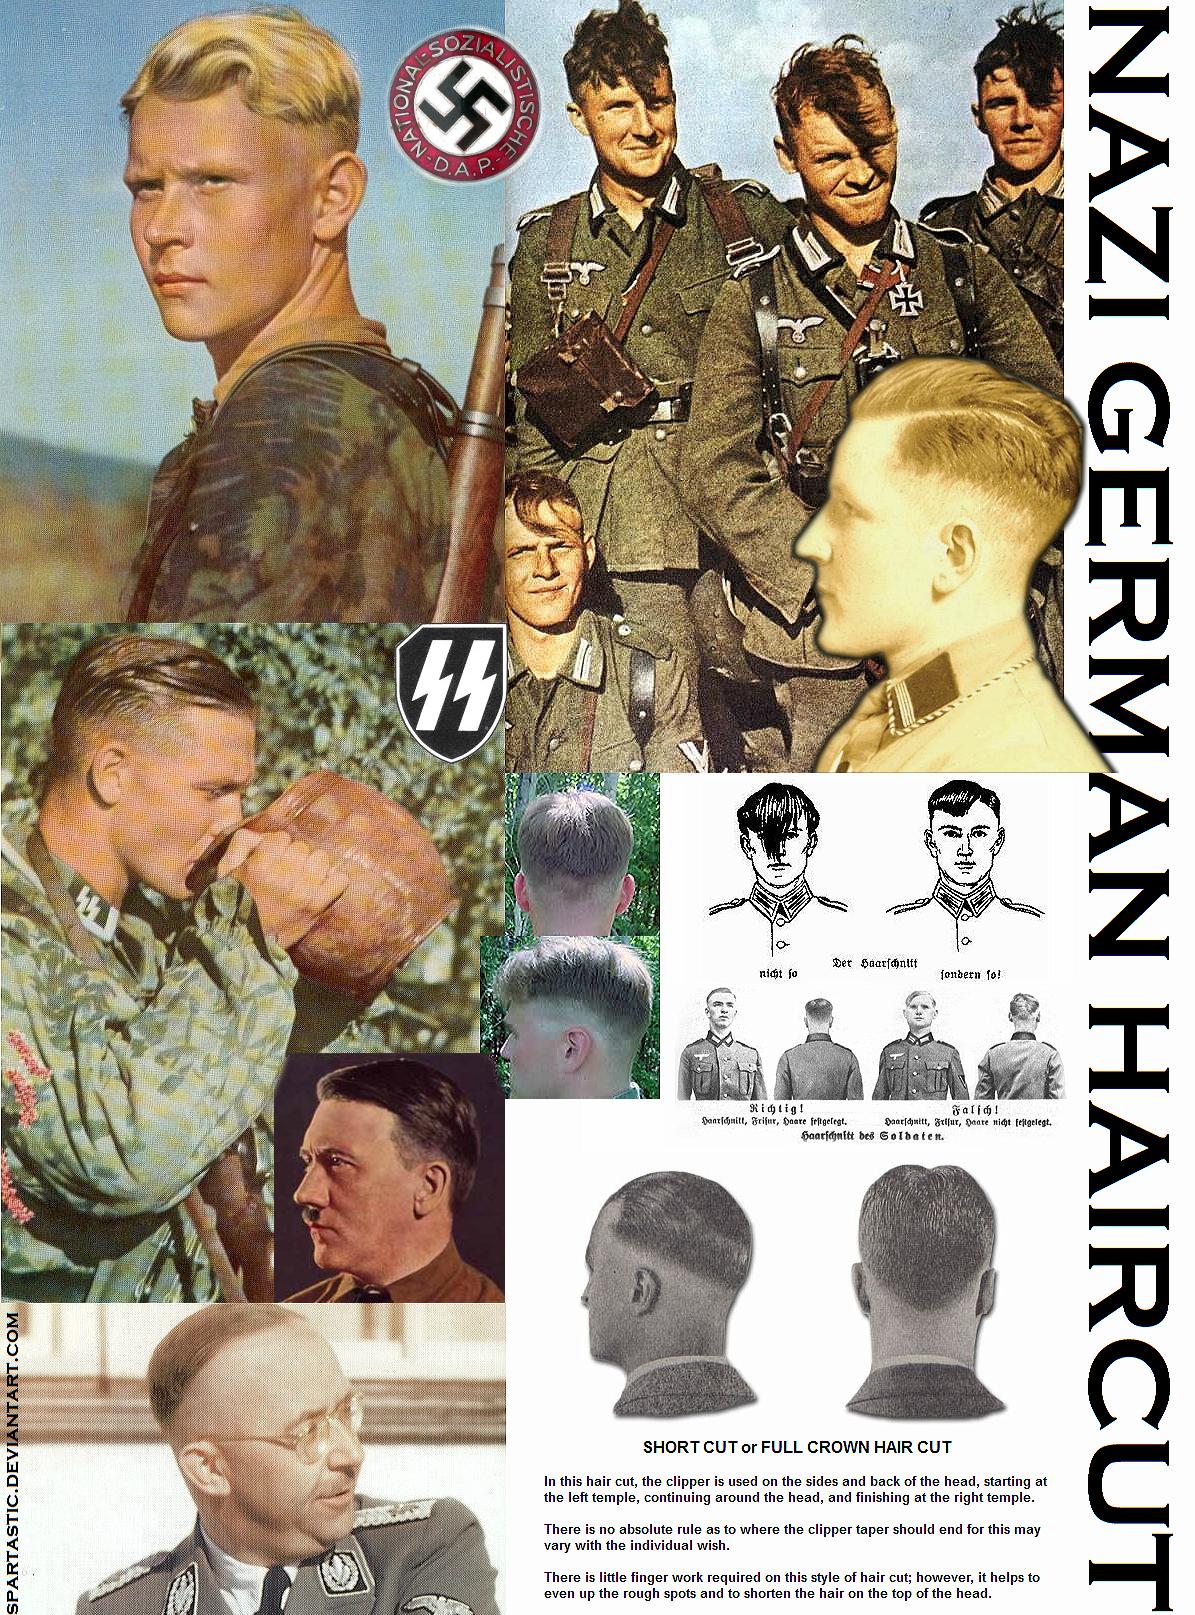 German Military Haircut Nazi german haircut by